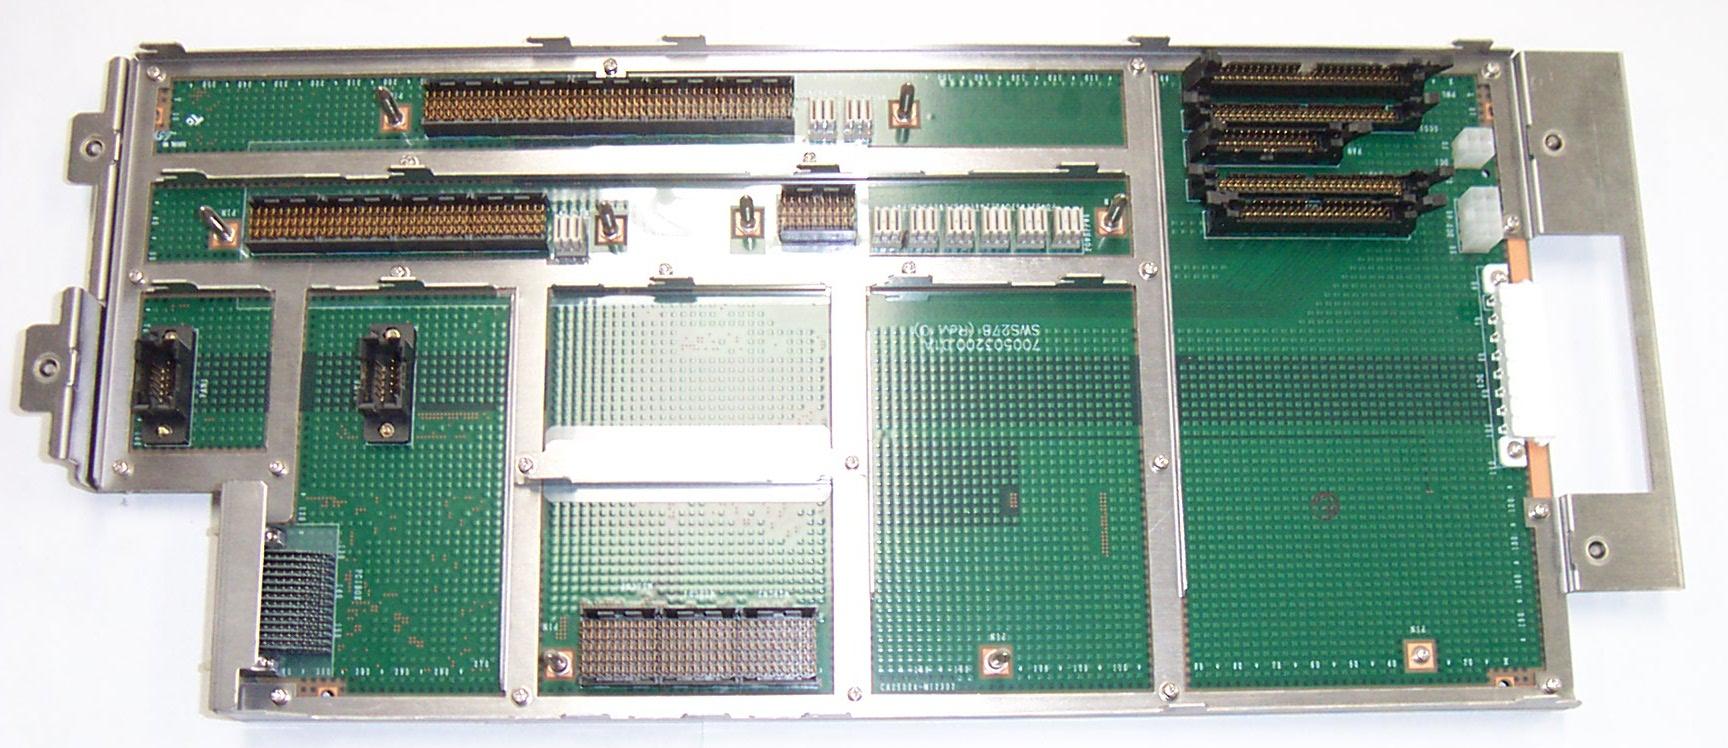 Fujitsu CA20004-B12X PrimePower 650 System Backplane